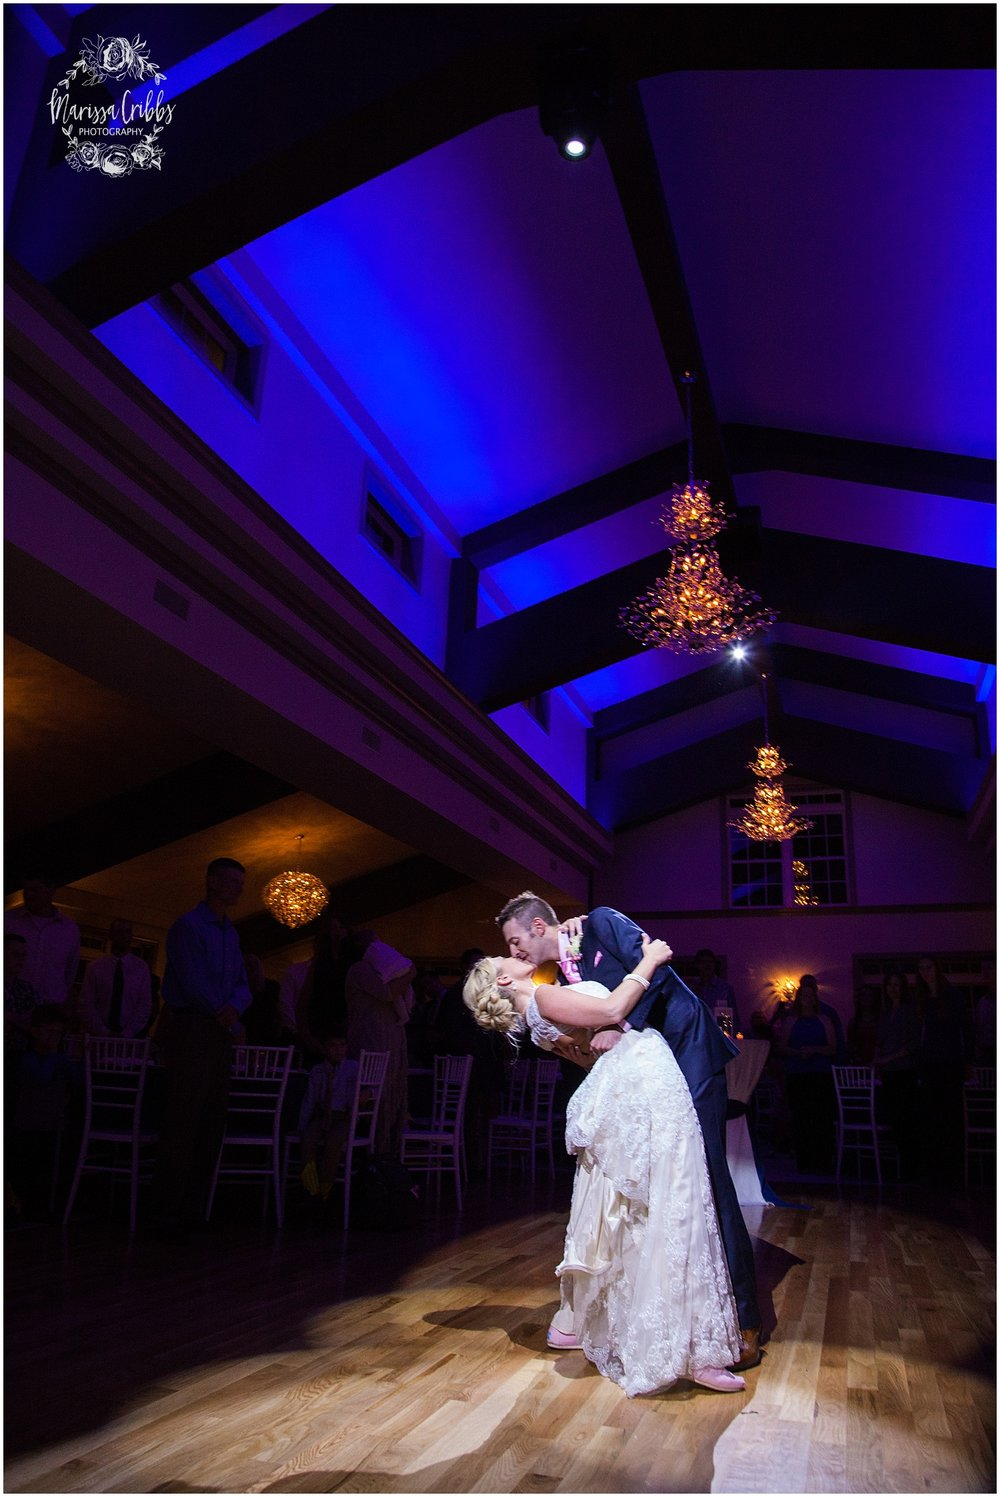 Alex & Amie | Eighteen Ninety Event Space | Marissa Cribbs Photography | Kansas City Perfect Wedding Guide_1387.jpg